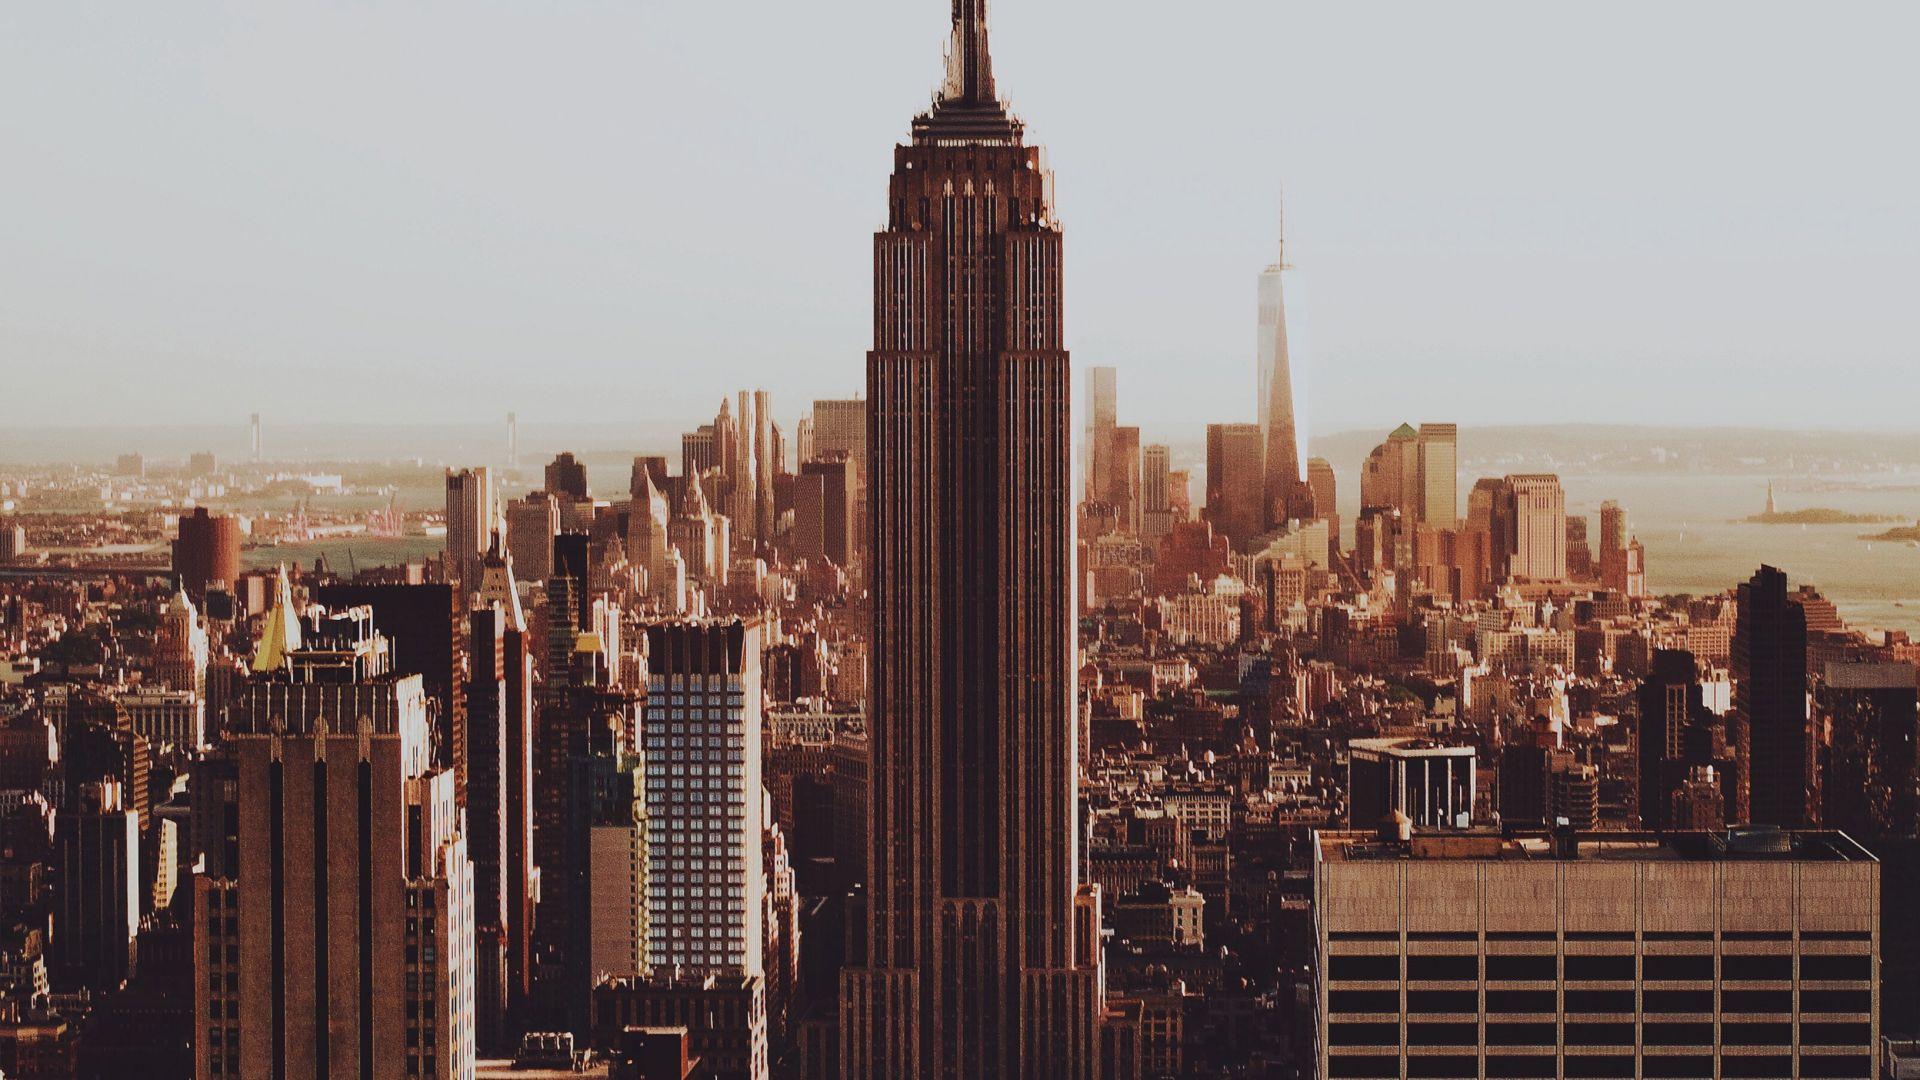 Desktop Wallpaper Buildings Empire State Building City New York